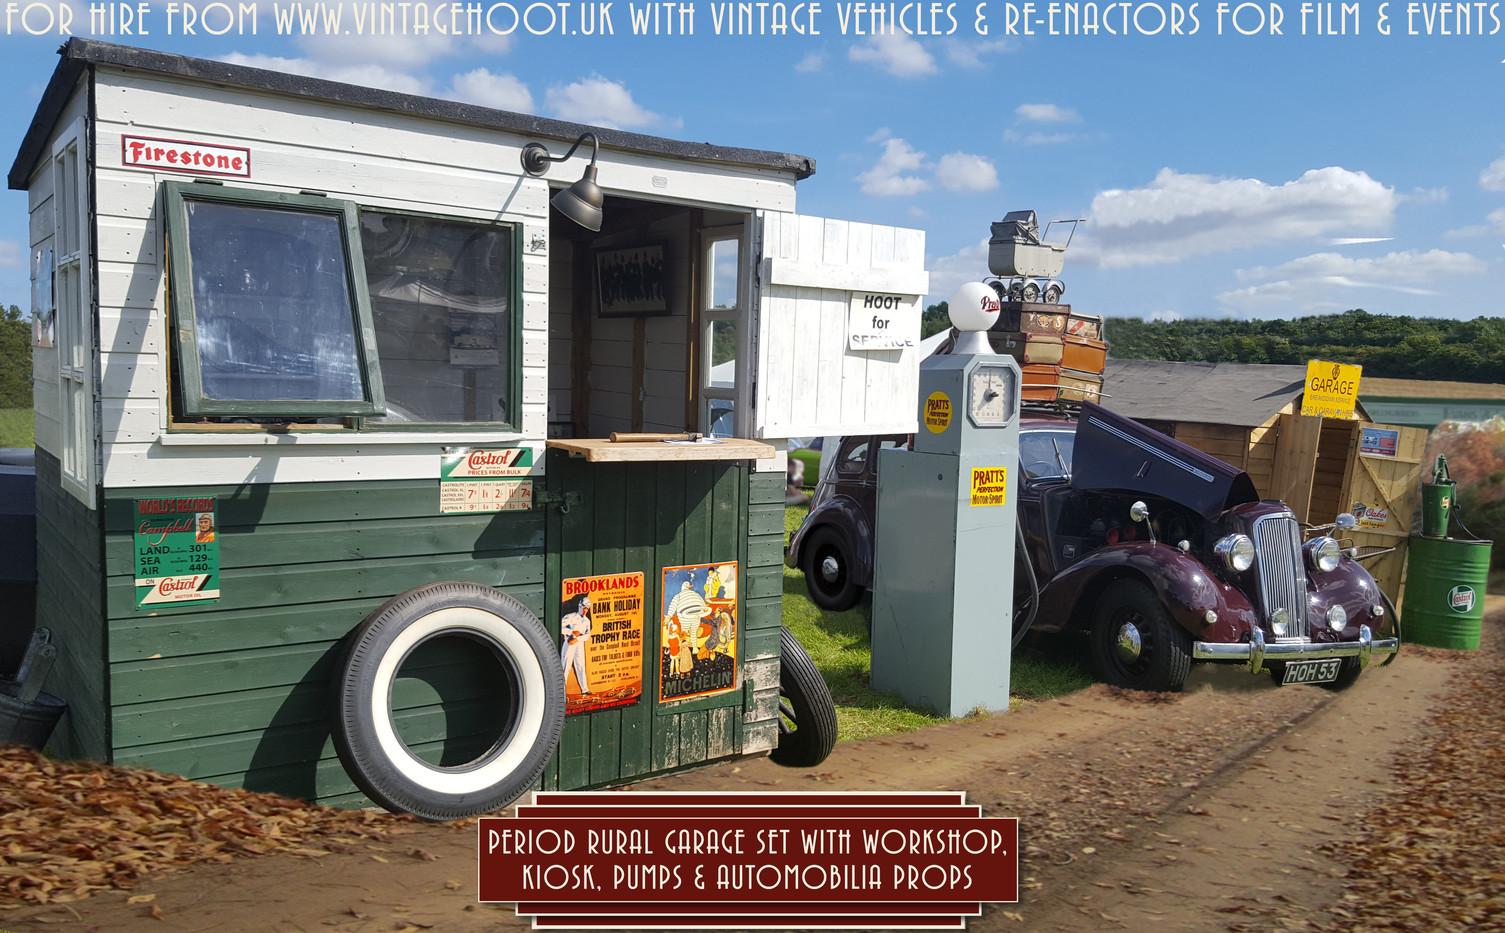 Garage set  VintageHoot.uk 1.jpg